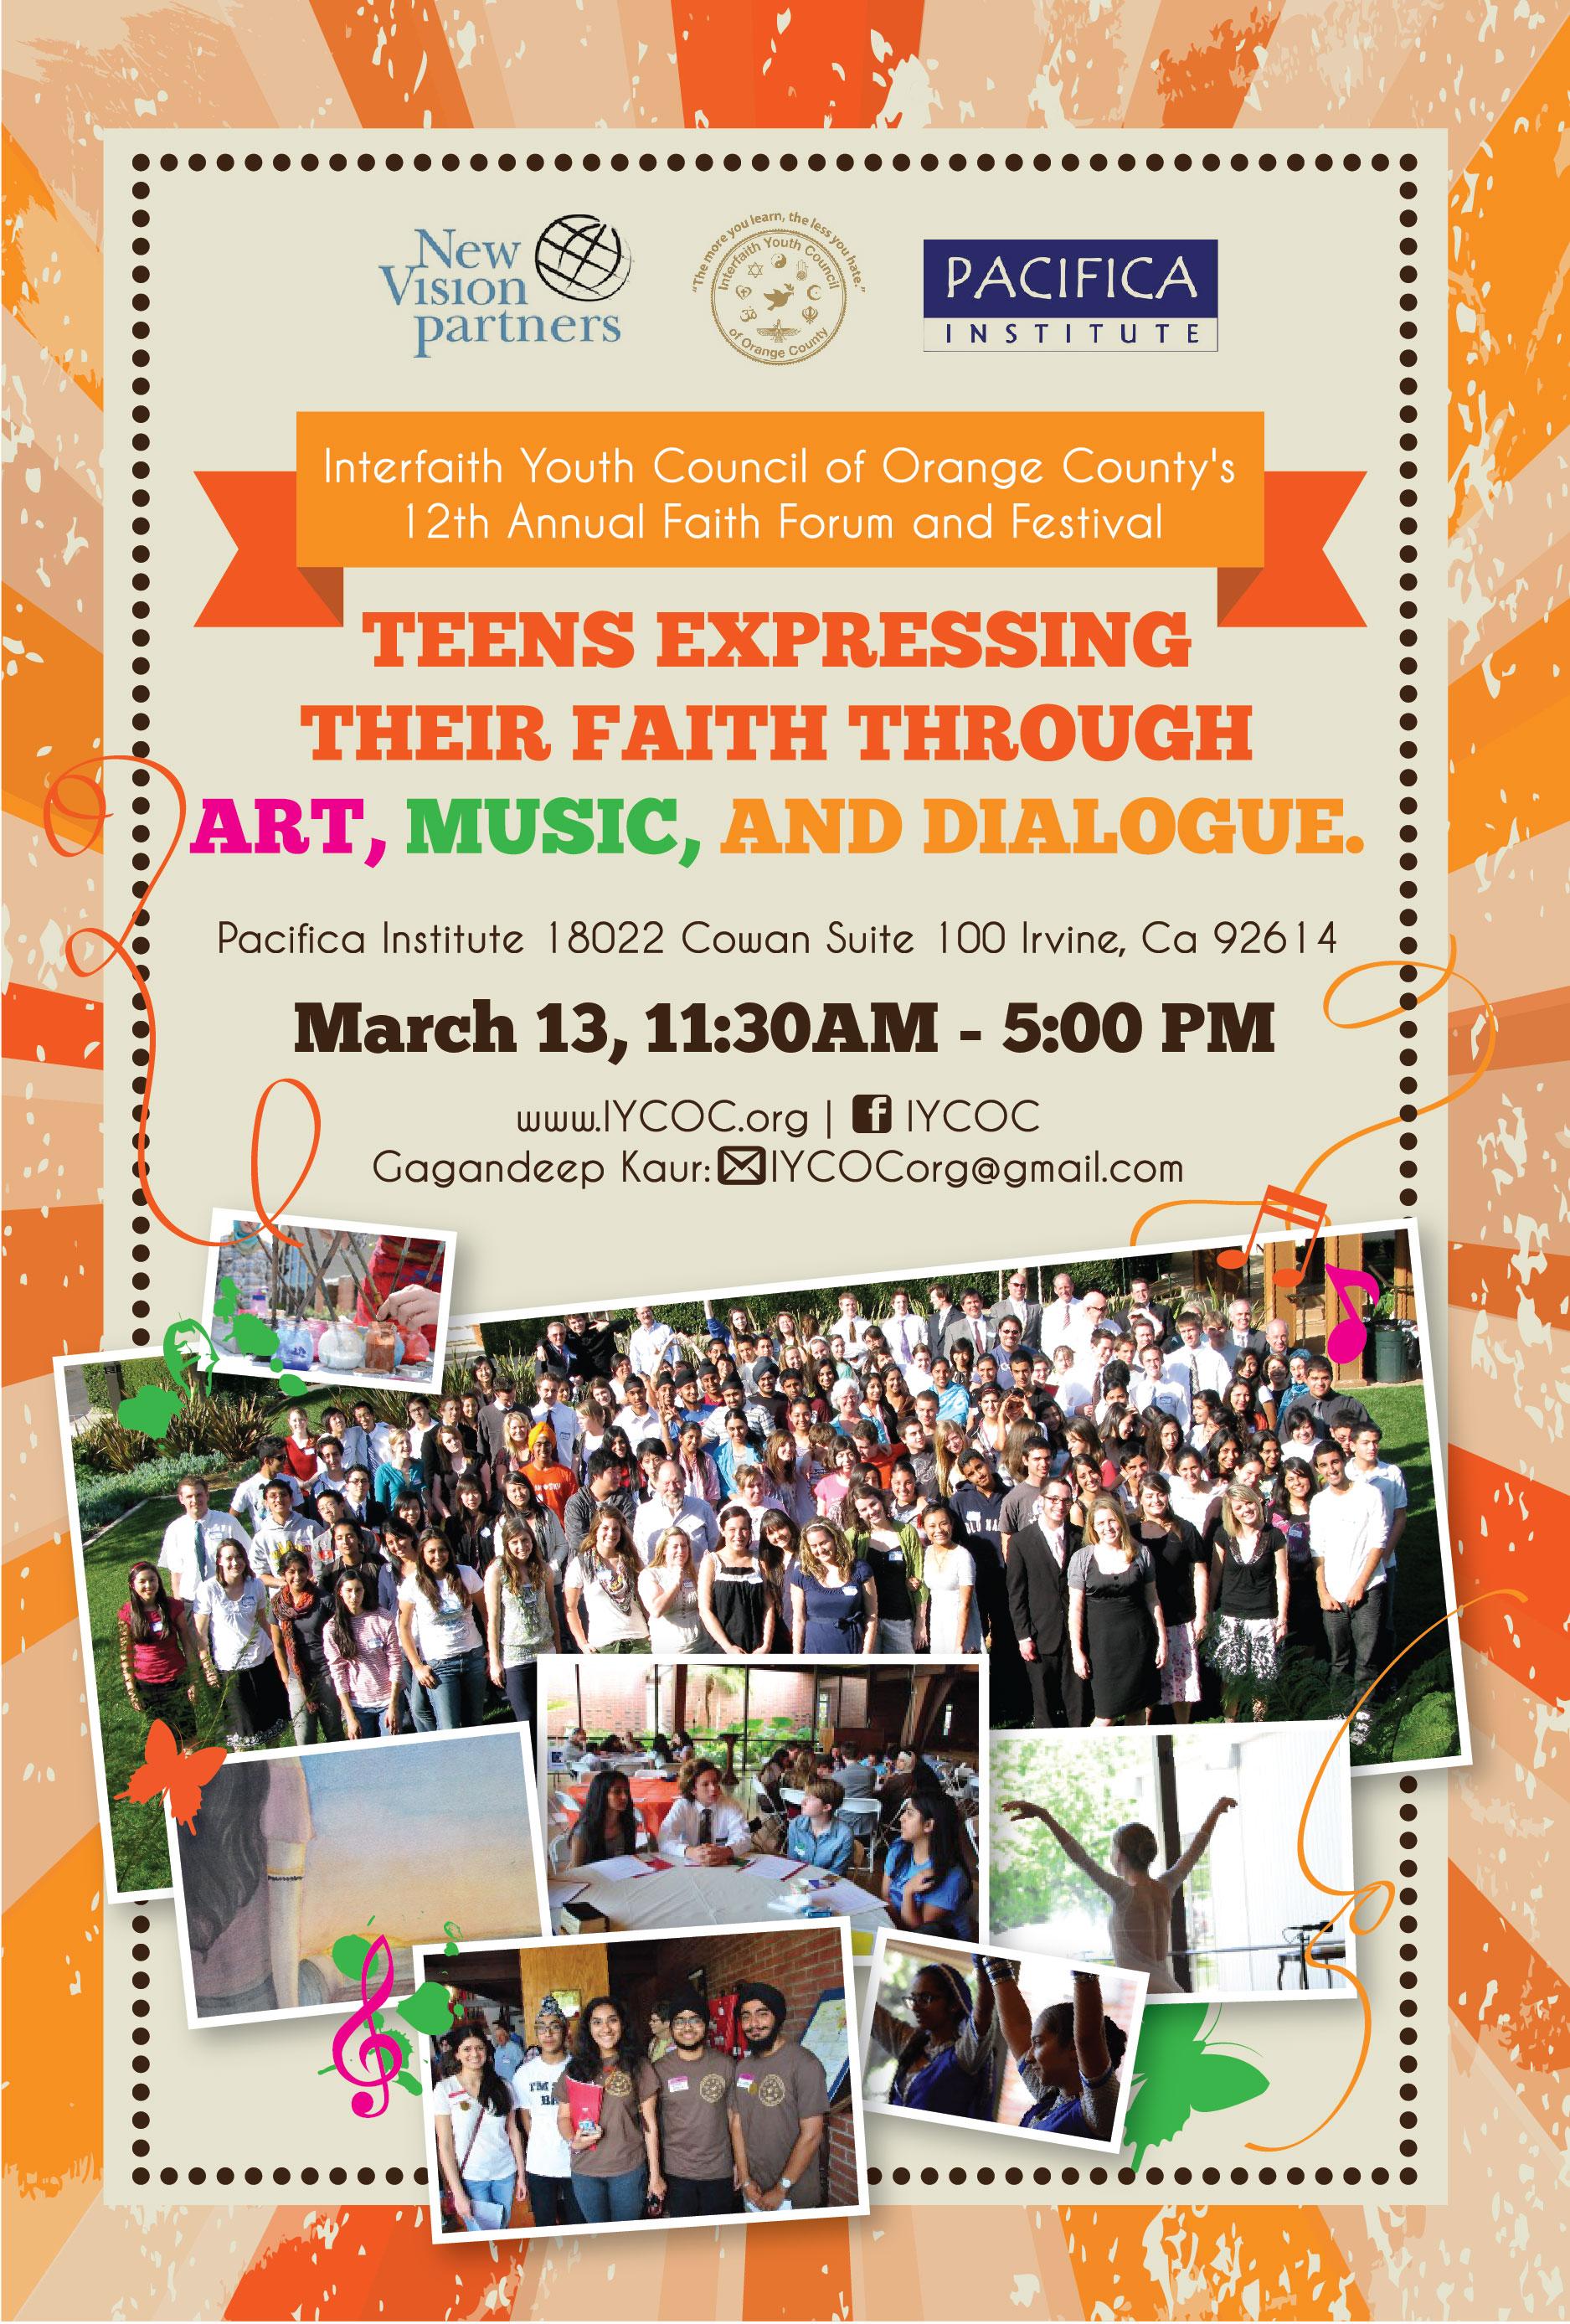 Interfaith Youth Festival in OC